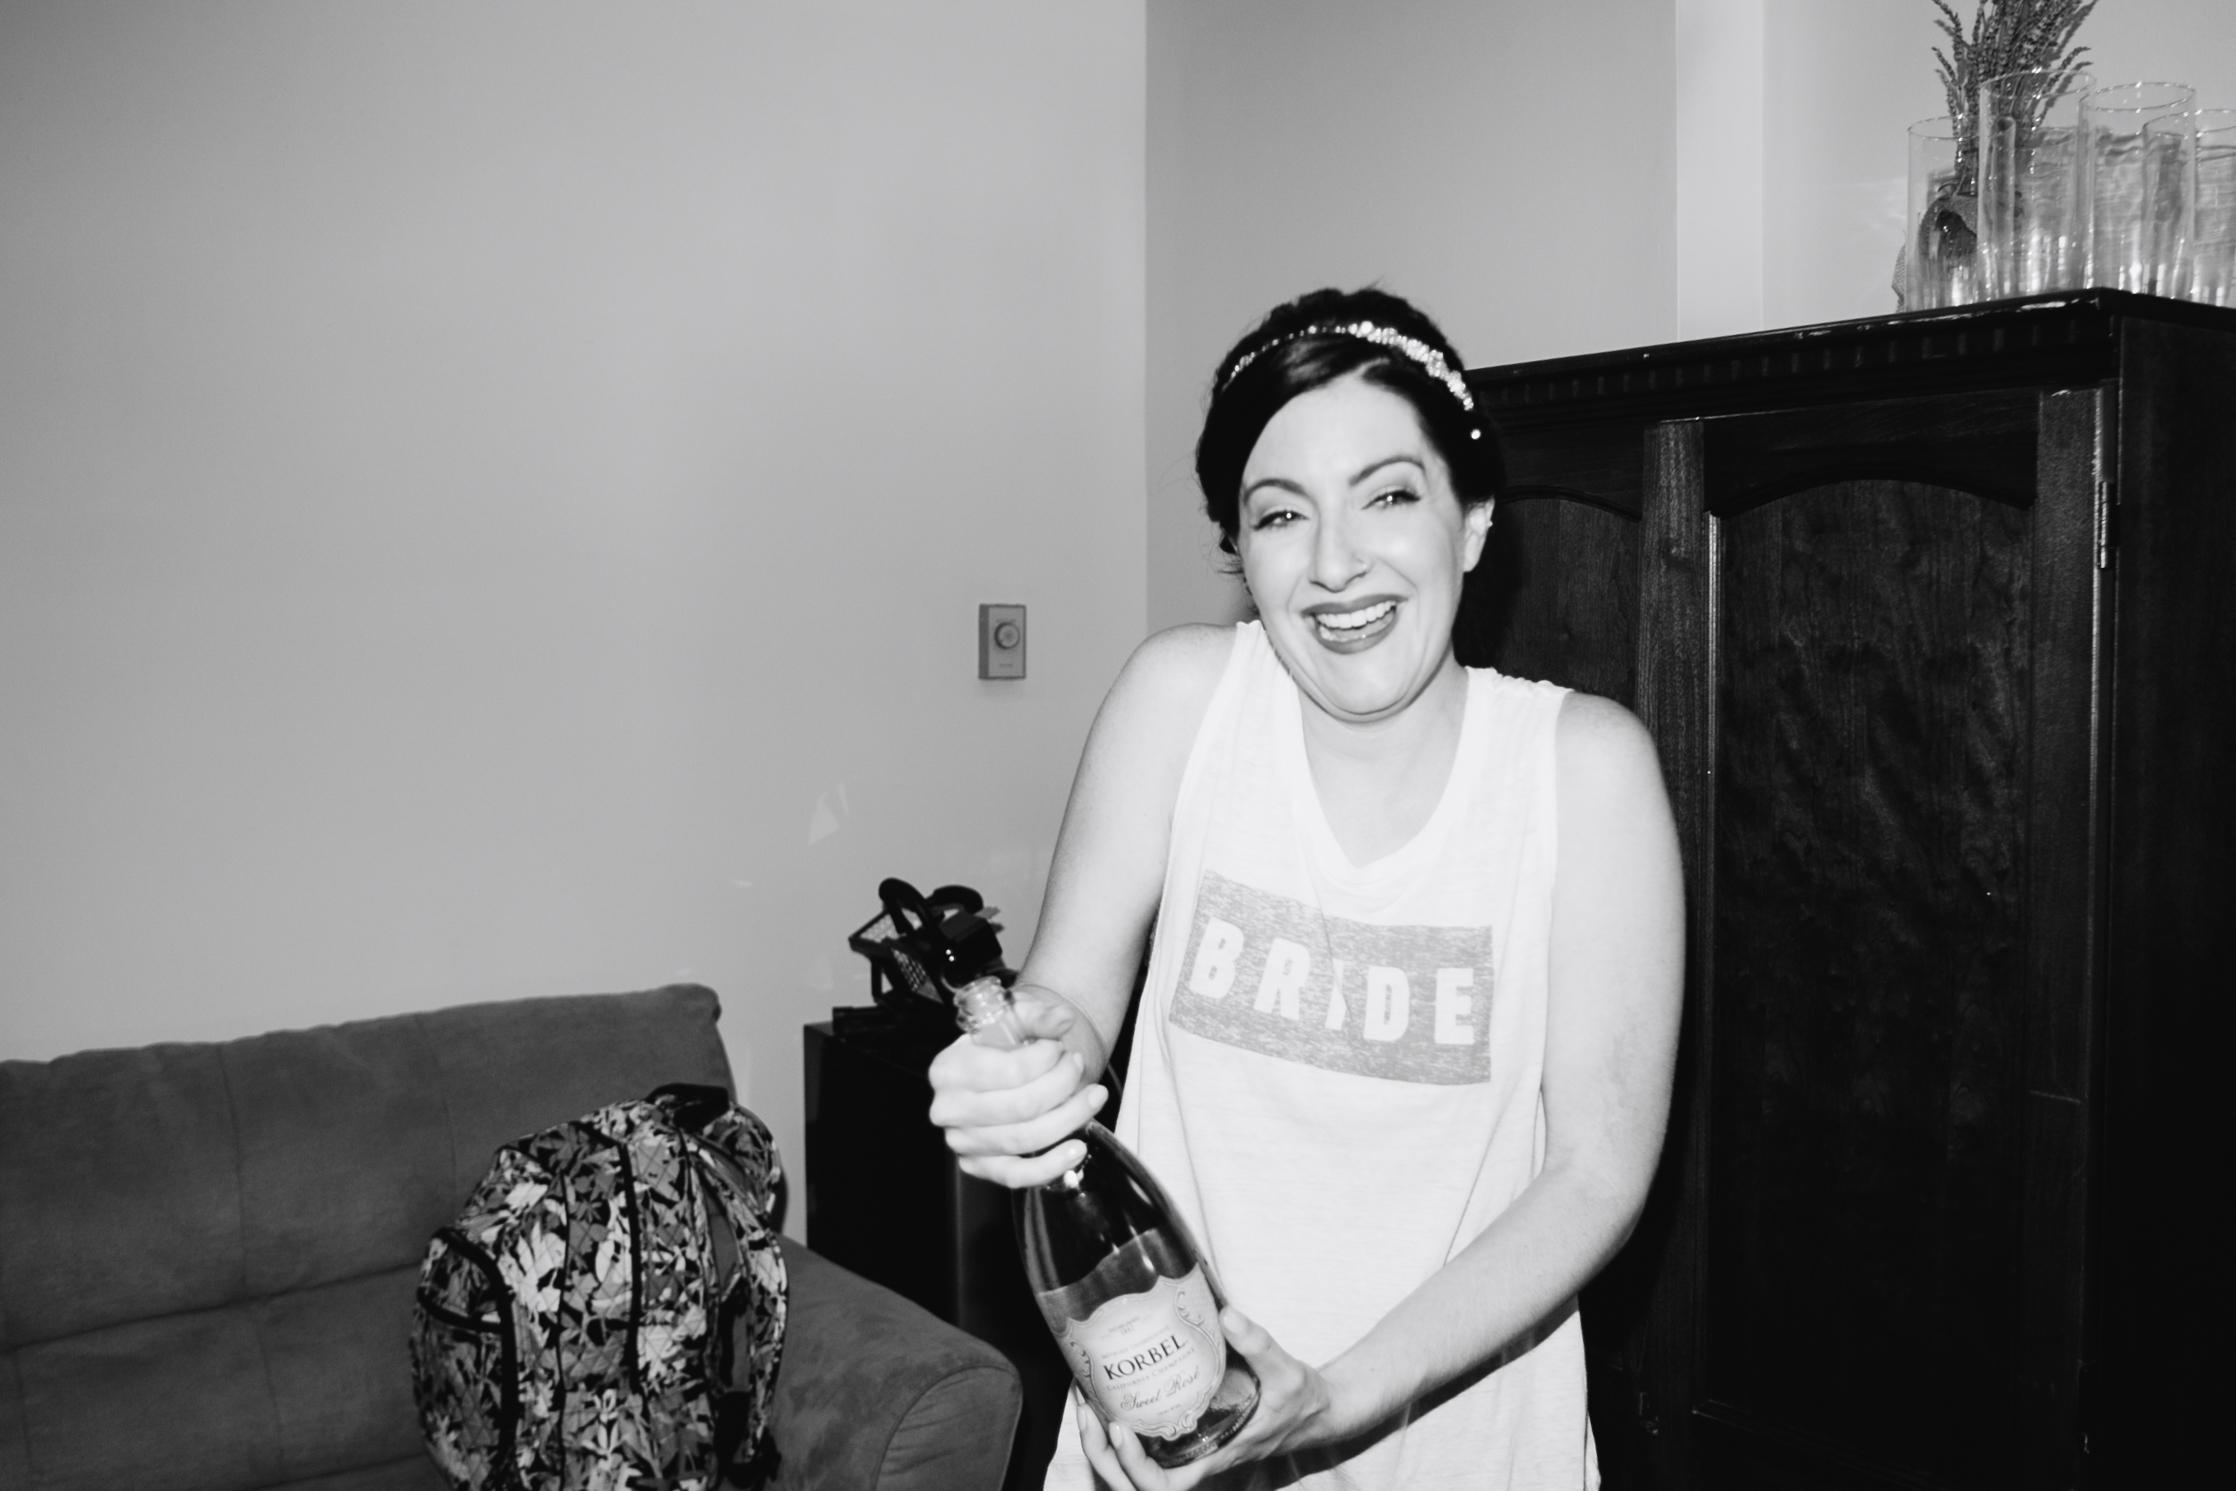 TYLER ARBORETUM WEDDING PHOTOGRAPHY LOVESTRUCK PICTURES-006.jpg